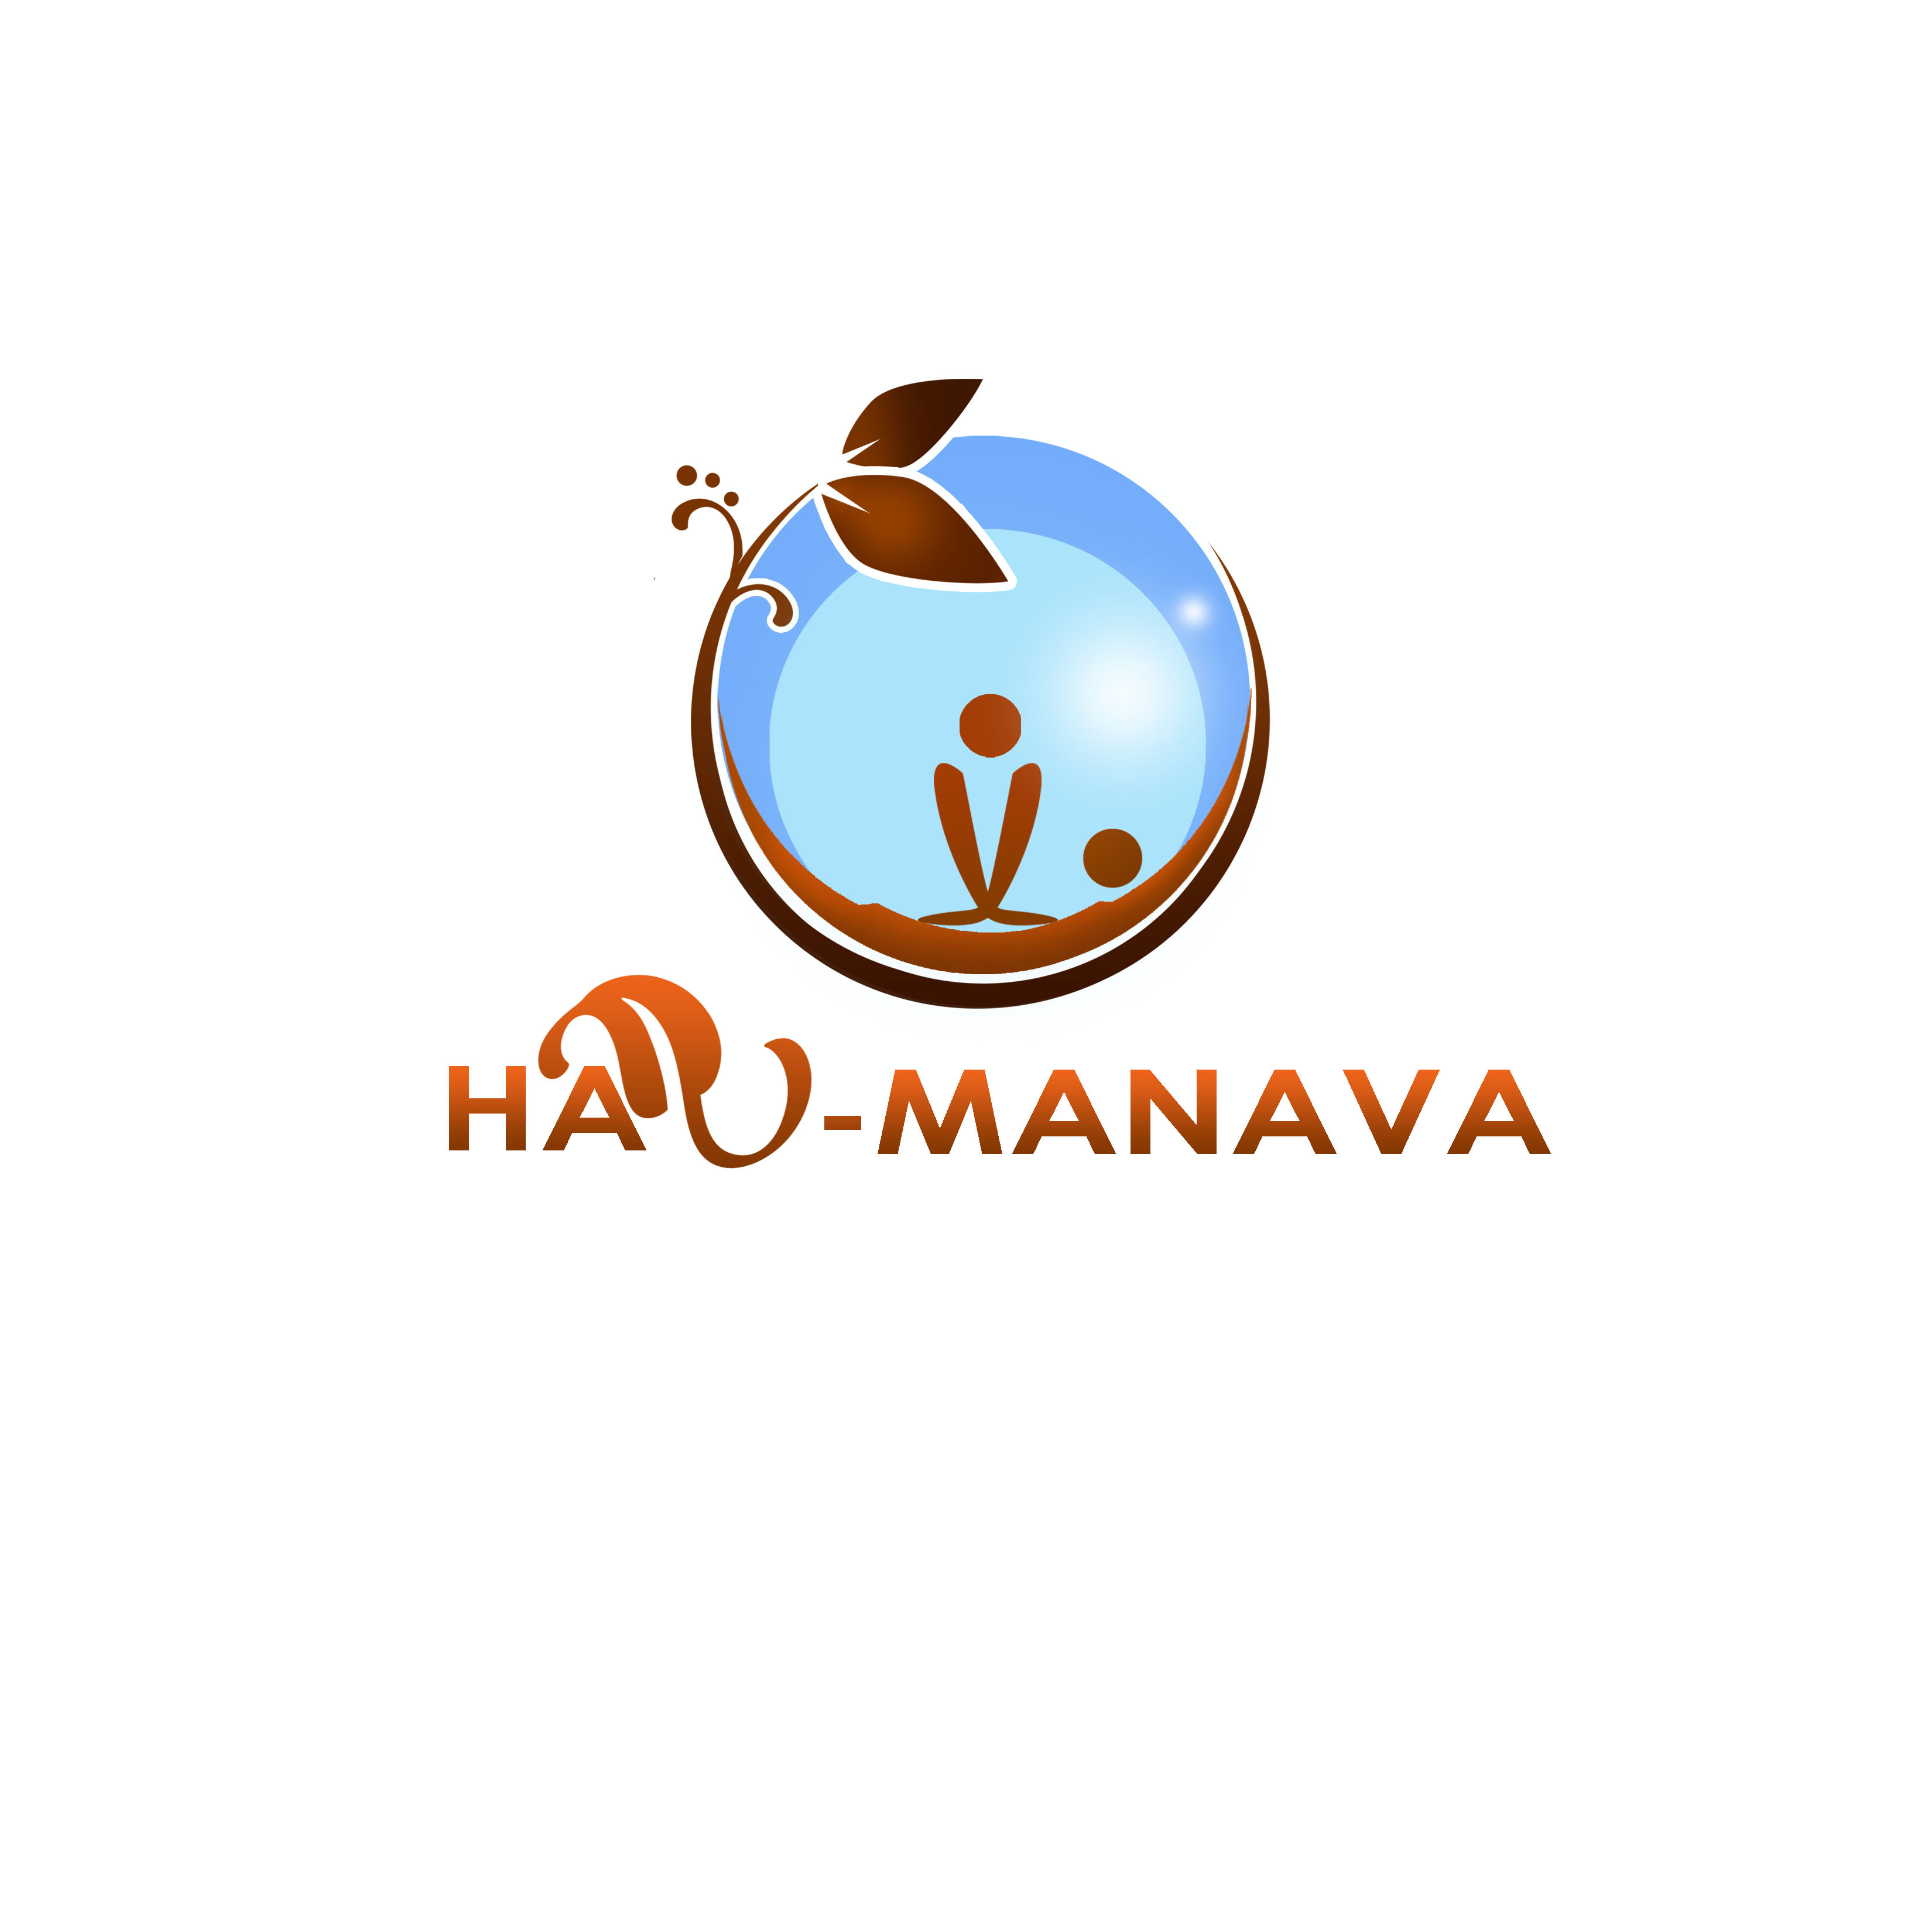 Logo Design by Allan Esclamado - Entry No. 3 in the Logo Design Contest Hau-Manava Logo Design.